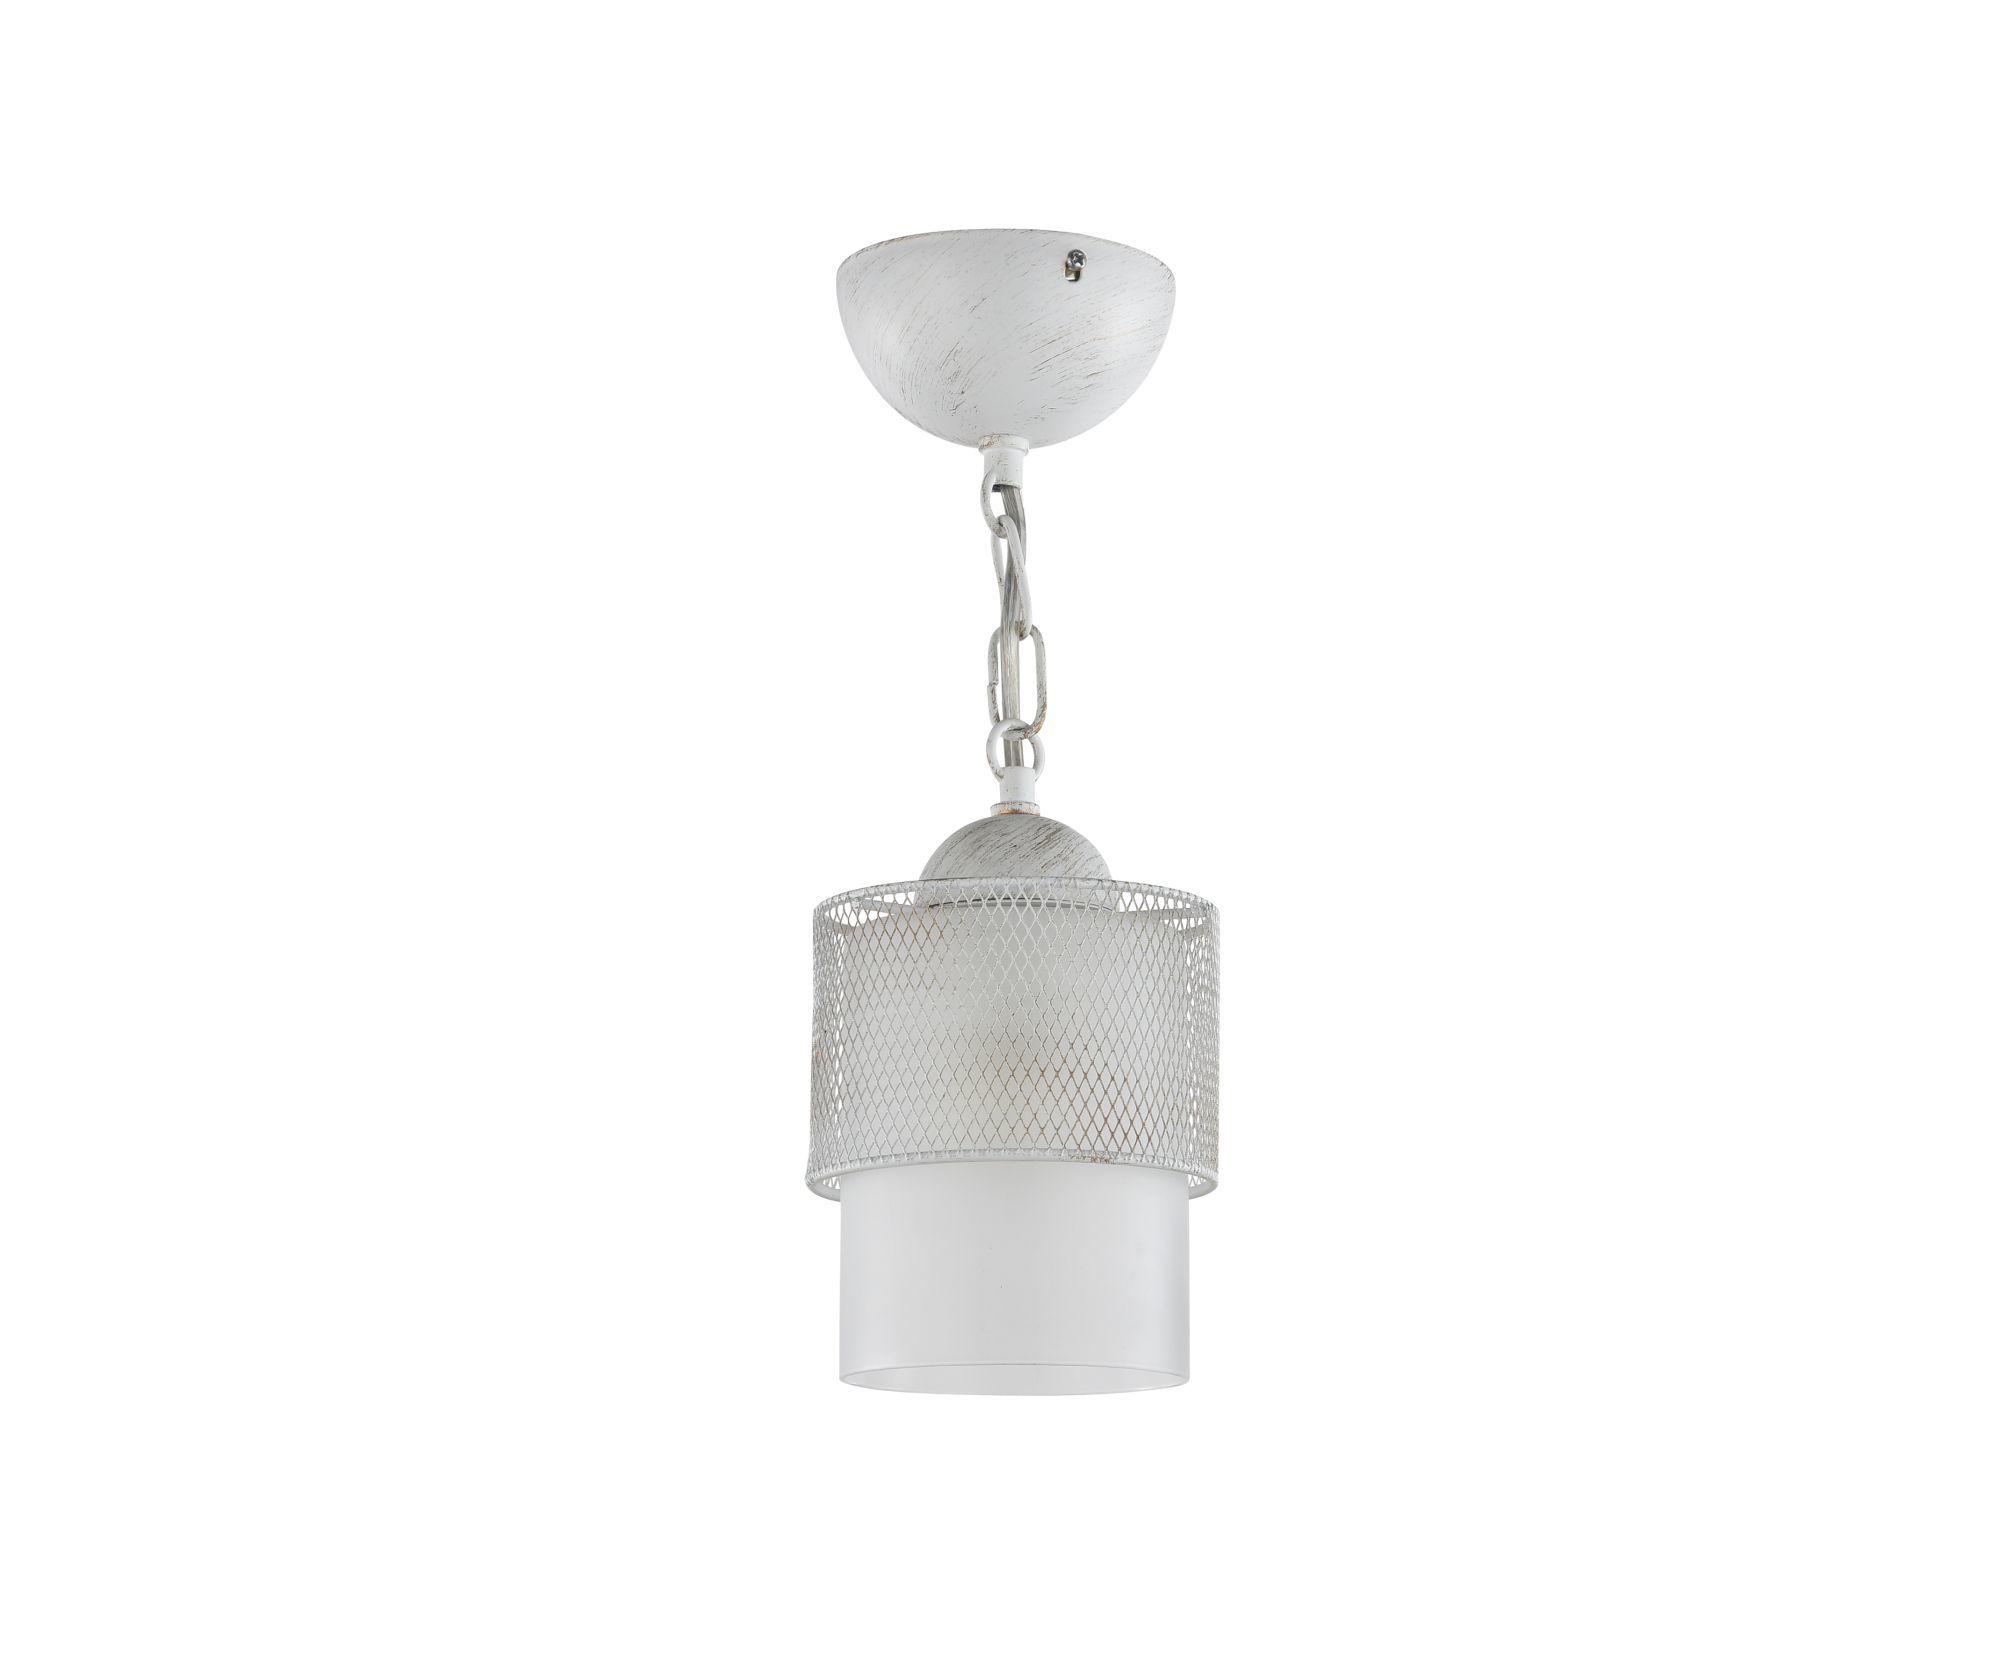 Подвесной светильник Freya Ornella FR2201-PL-01-WG (fr201-11-w), 1xE27x60W, белый, металл, металл со стеклом/пластиком - фото 1